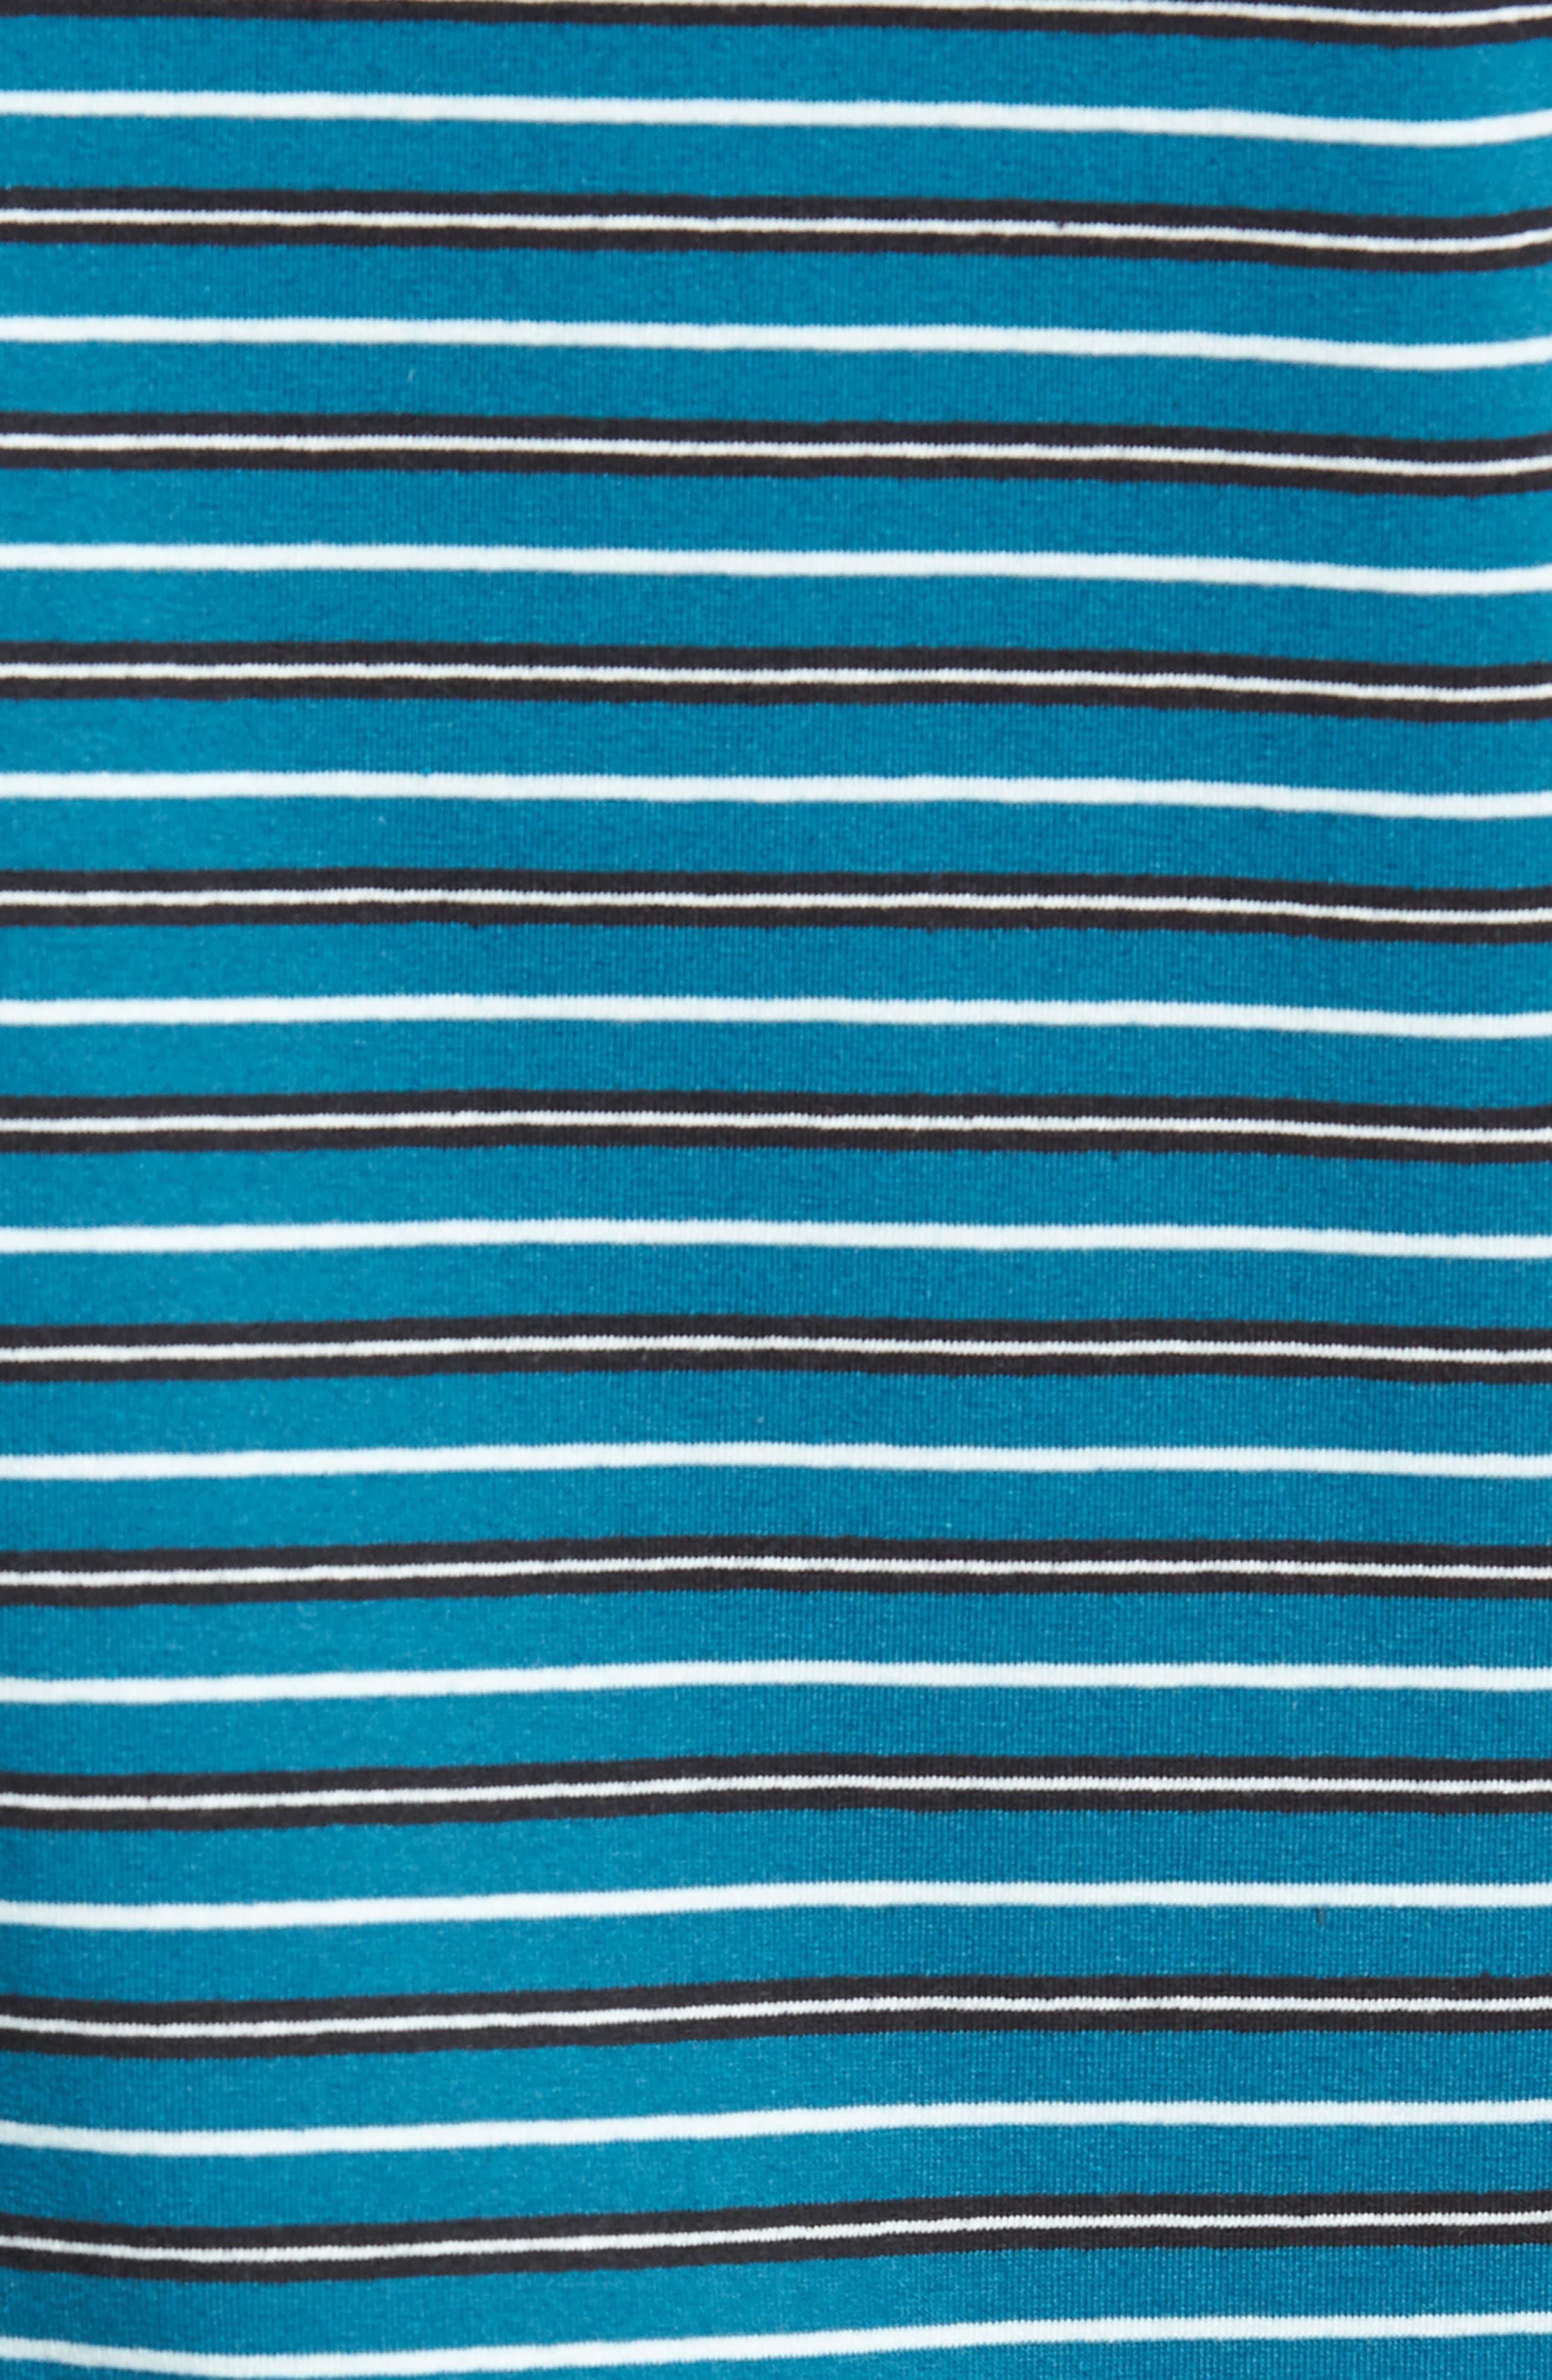 Striped T-Shirt,                             Alternate thumbnail 5, color,                             TEAL GREEN-WHITE STRIPE